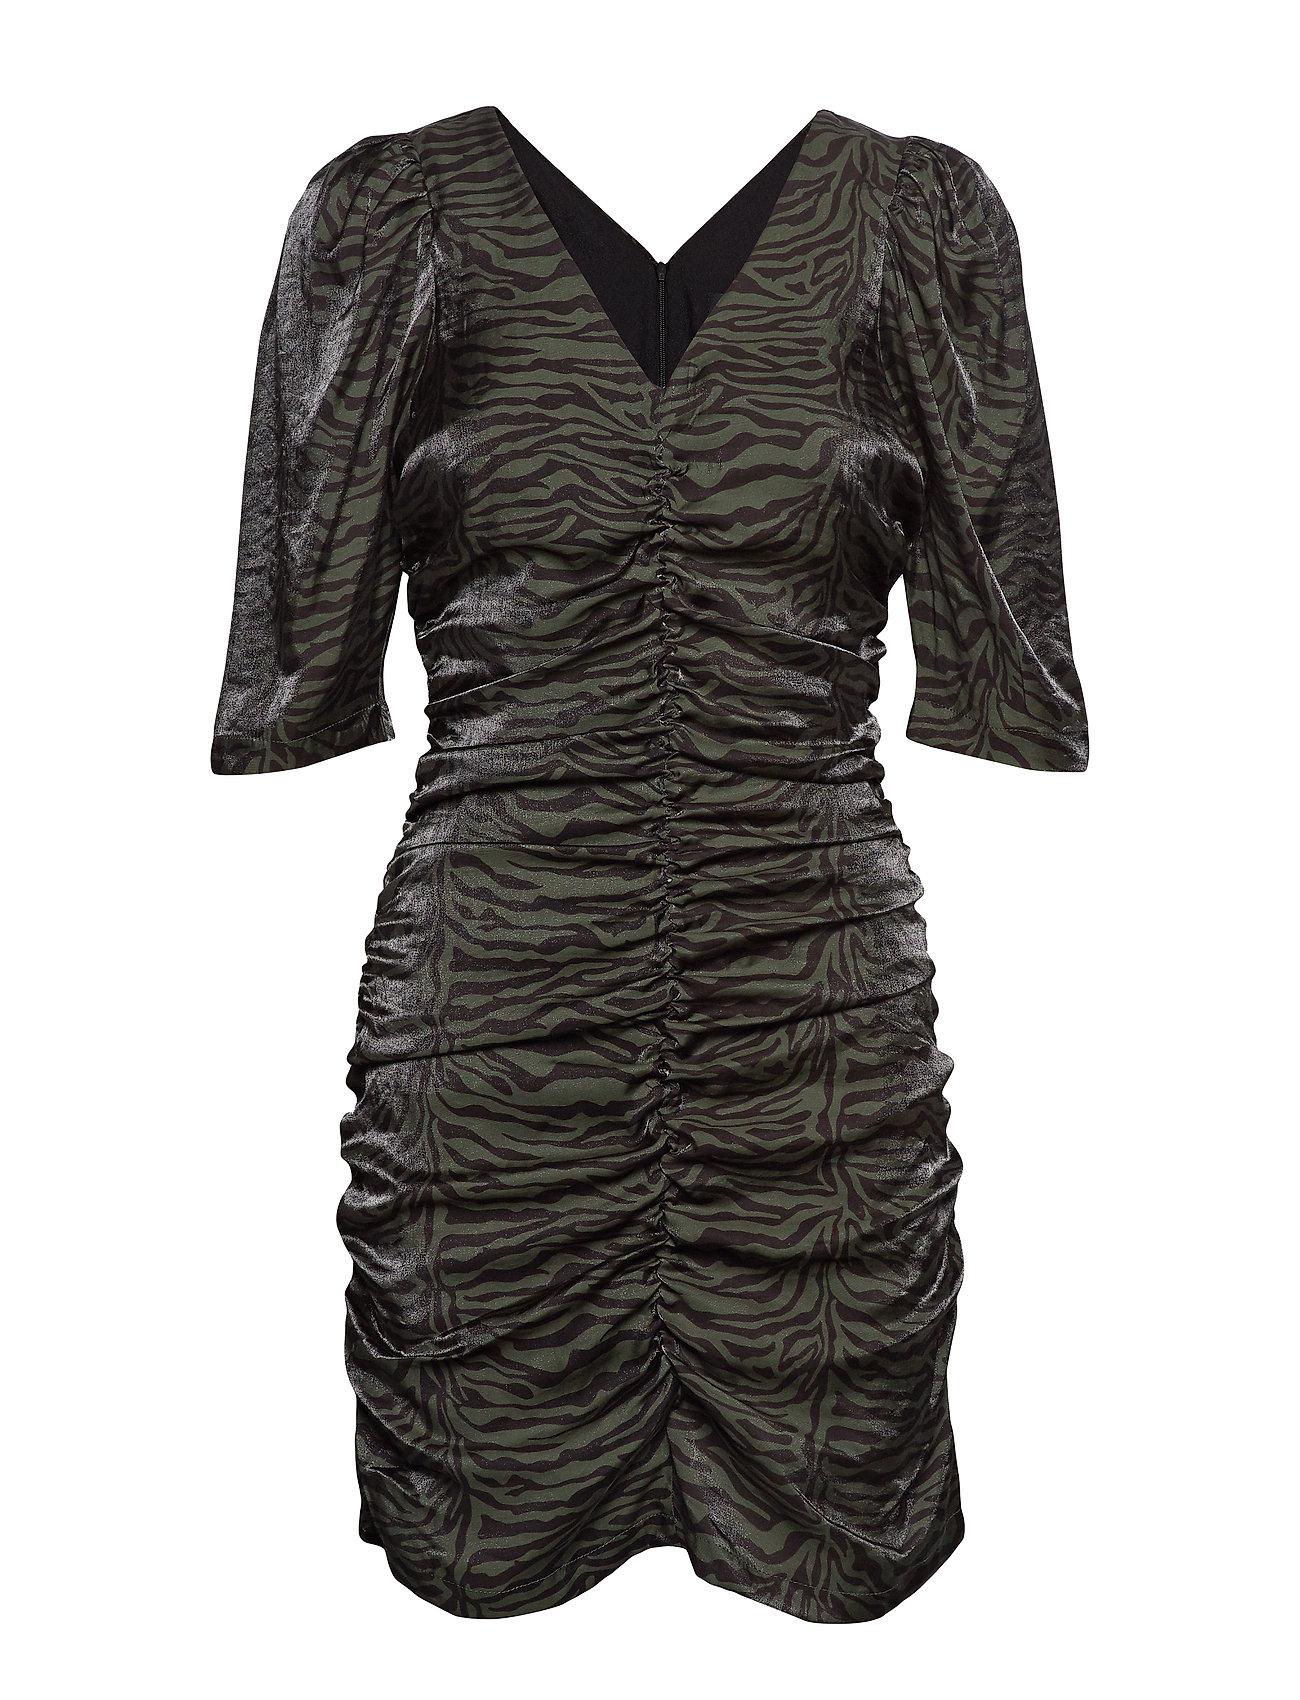 Soaked in Luxury SL Alexi Dress - FOREST NIGHT ZEBRA PRINT